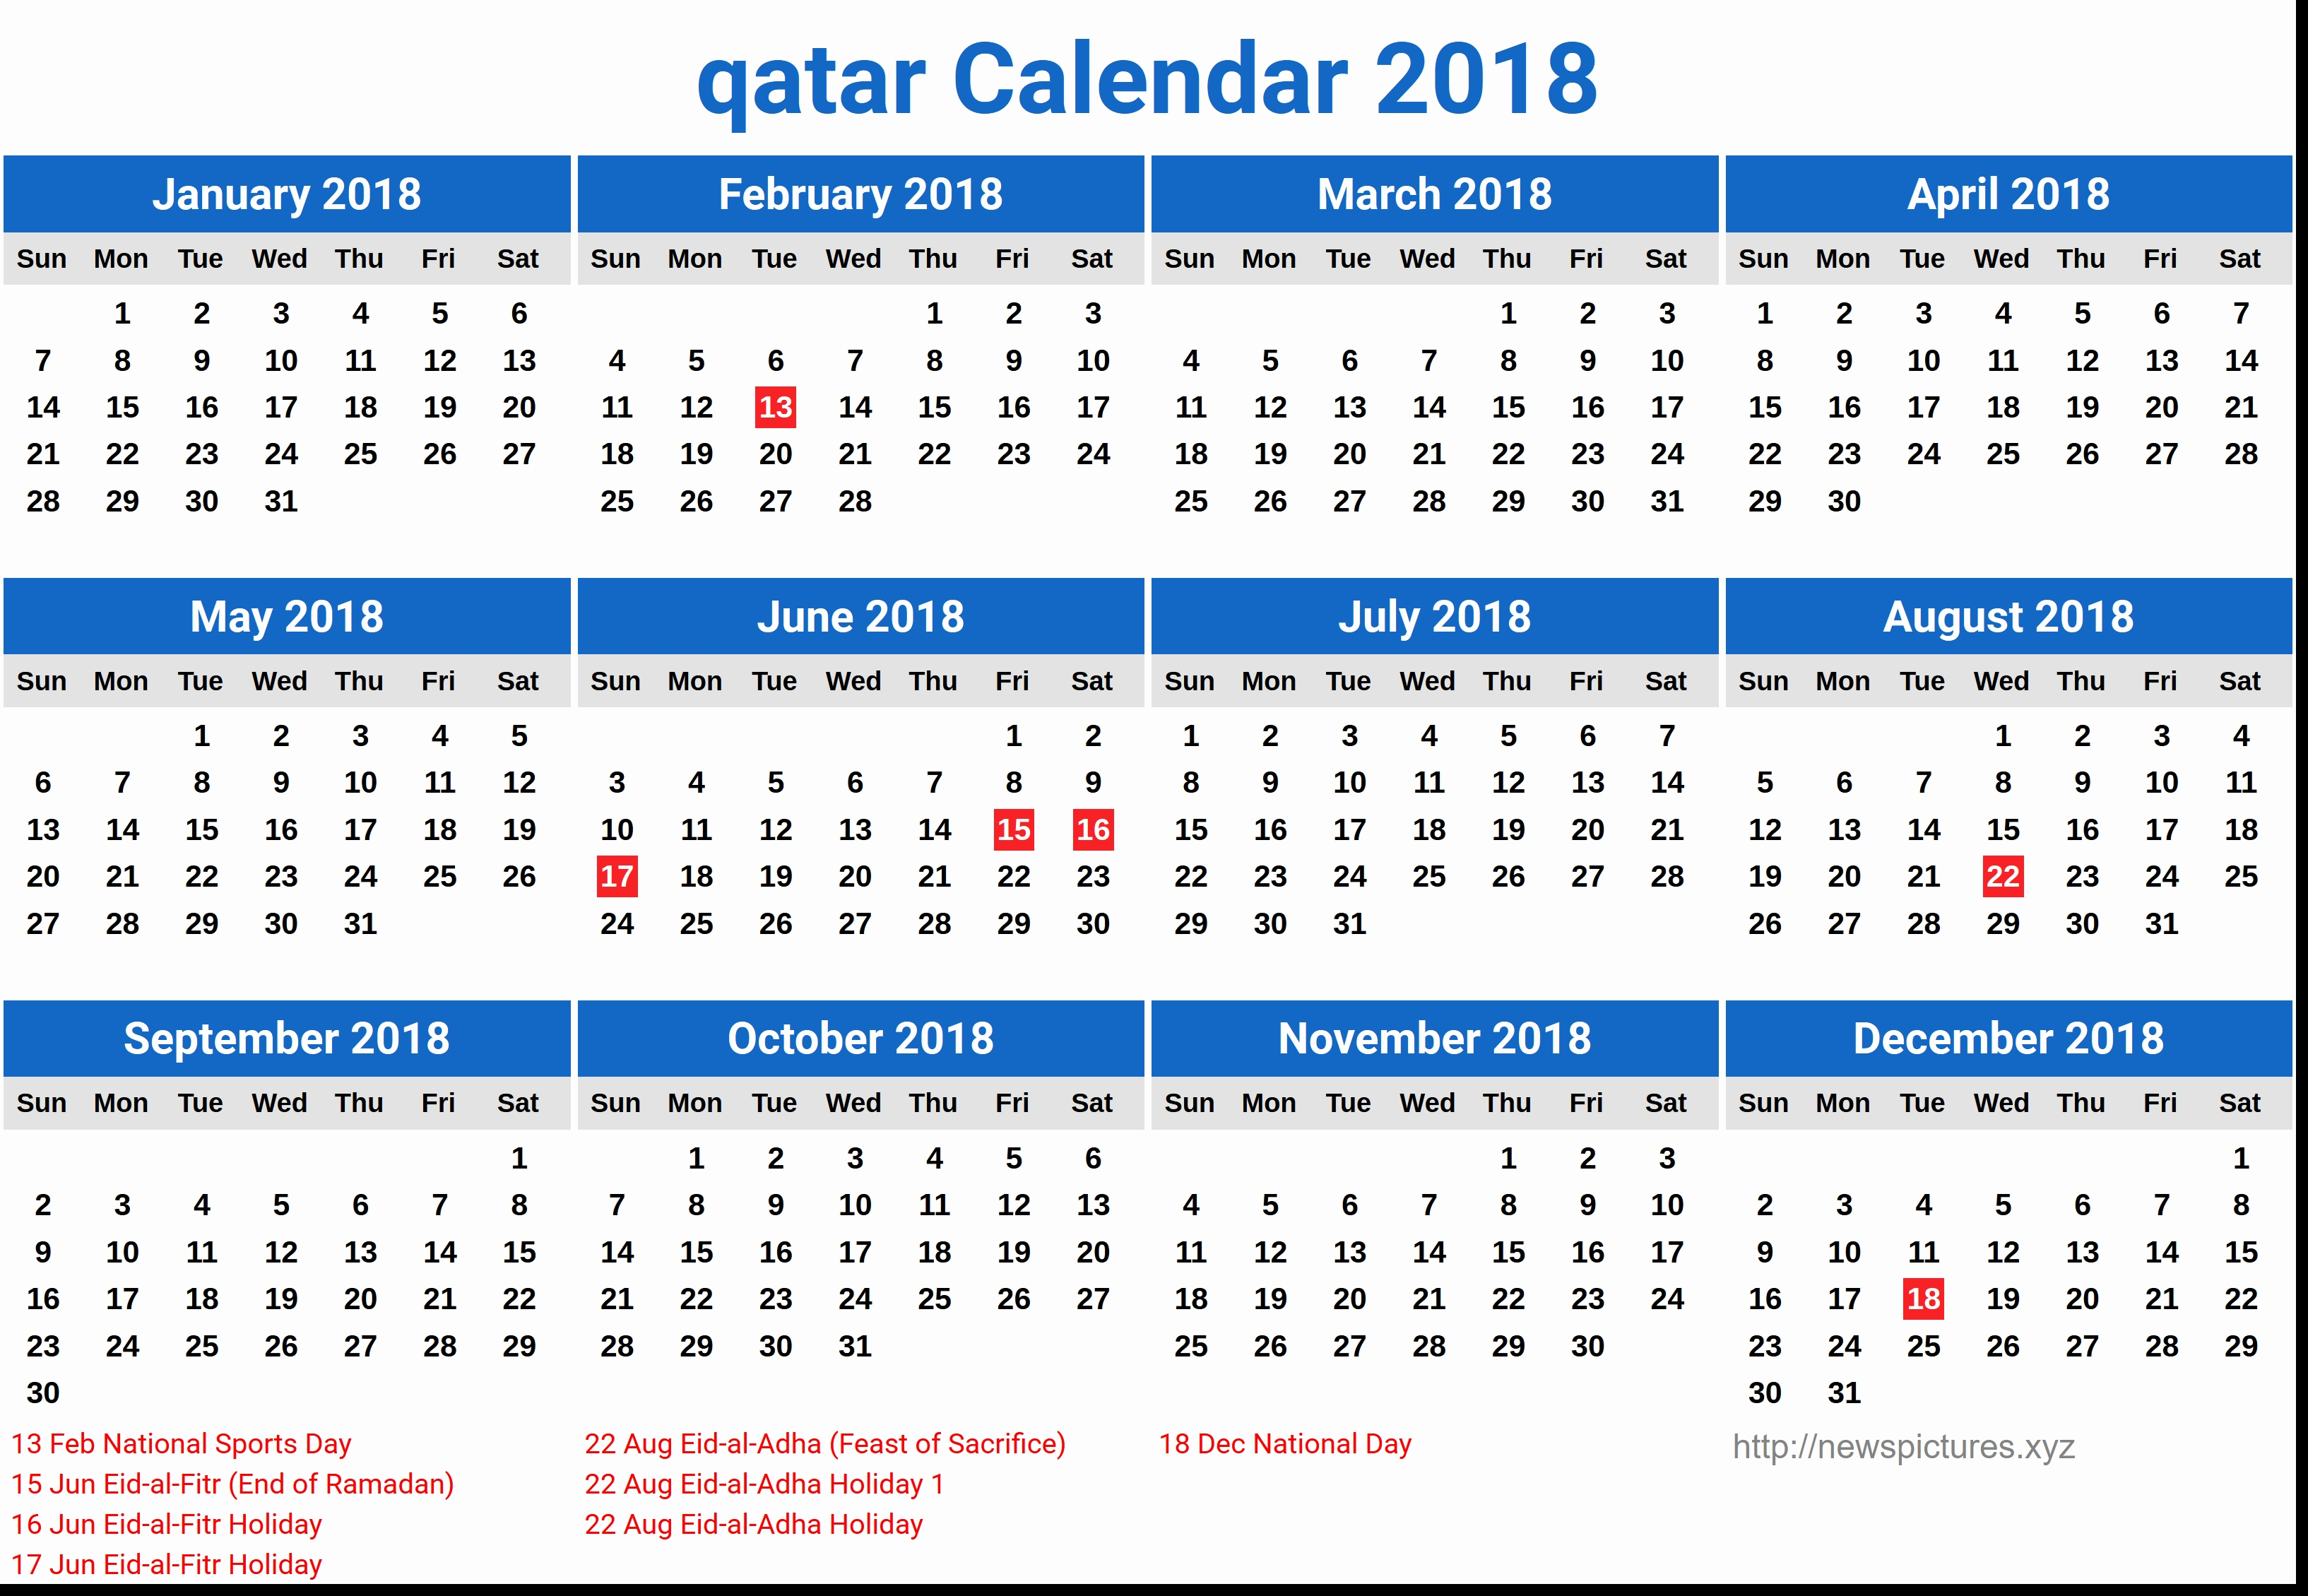 Qatar Calendar 2019 With Hong Kong Free 2018 Printable   Seimado Calendar 2019 Hong Kong